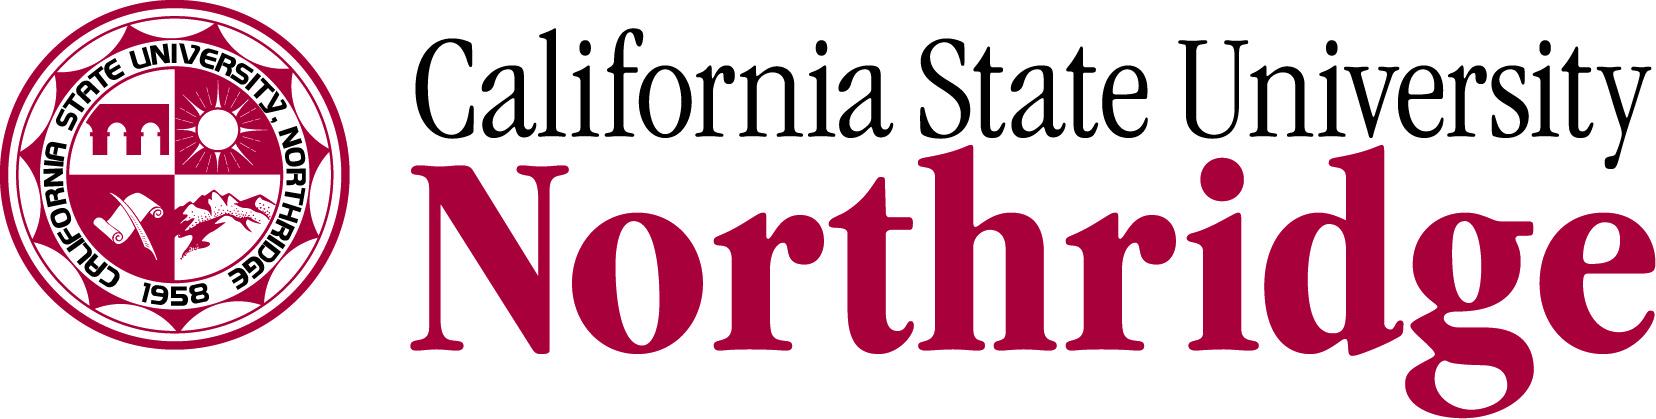 CSUN Wordmark Seal Horizontal.jpg